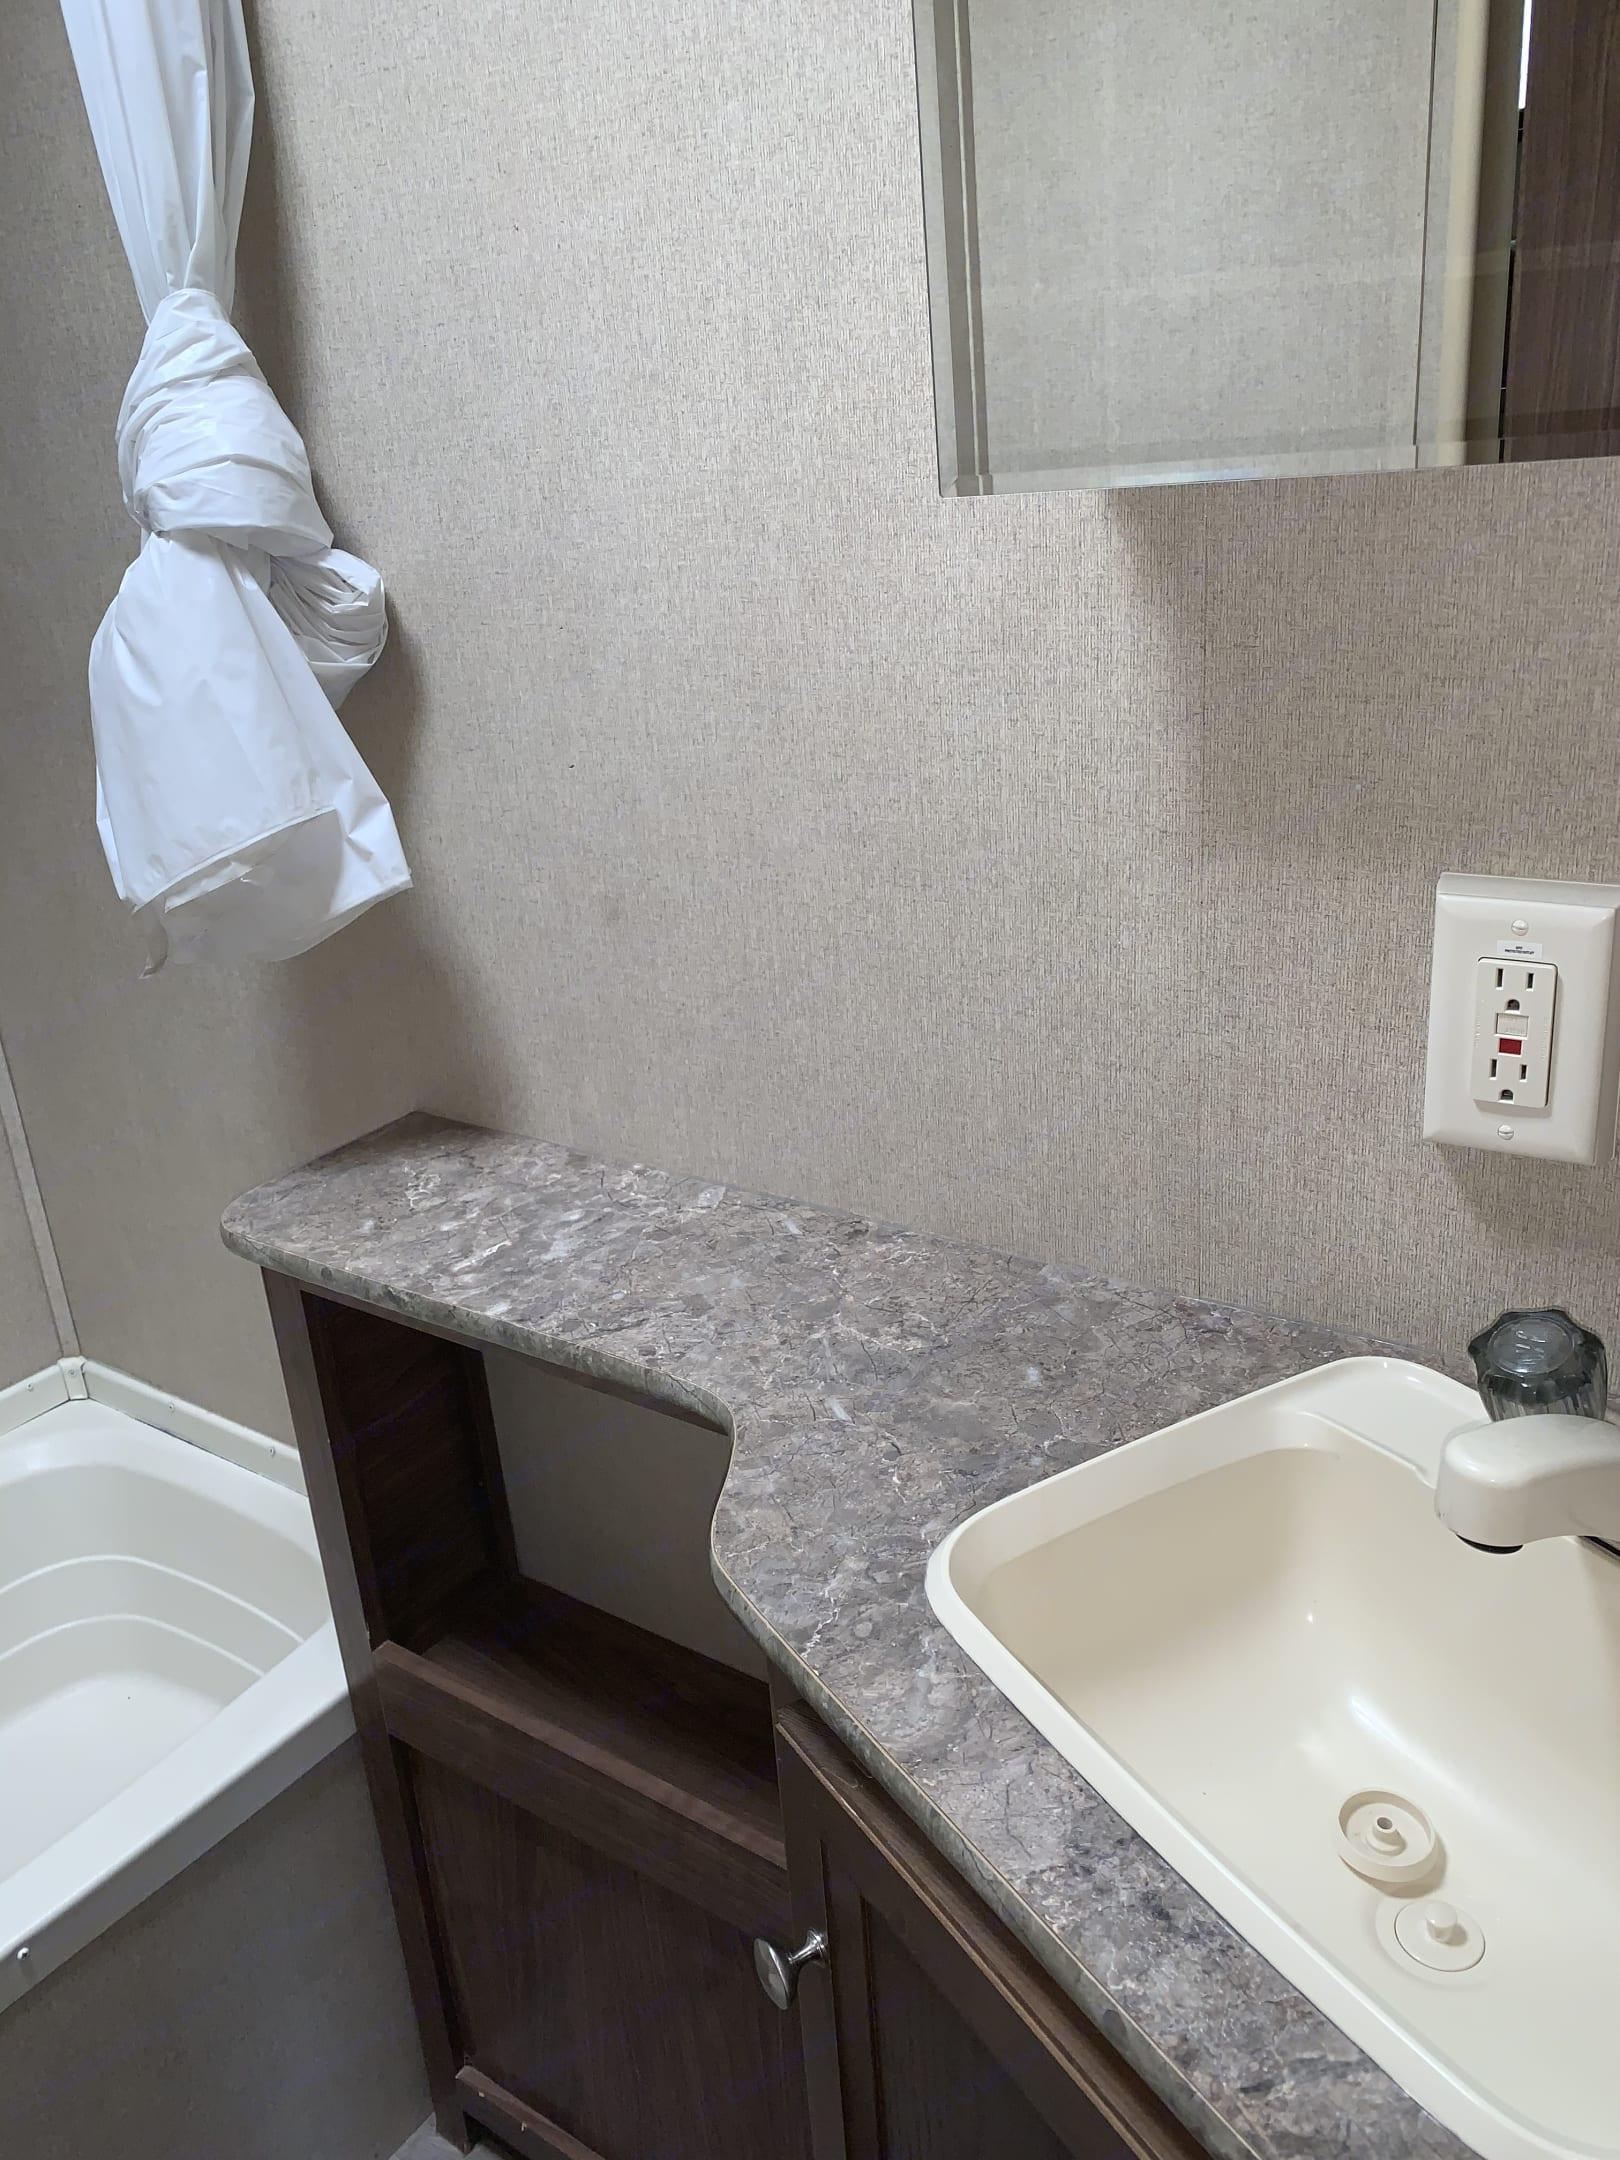 Bathroom counter. Dutchmen Coleman 2018